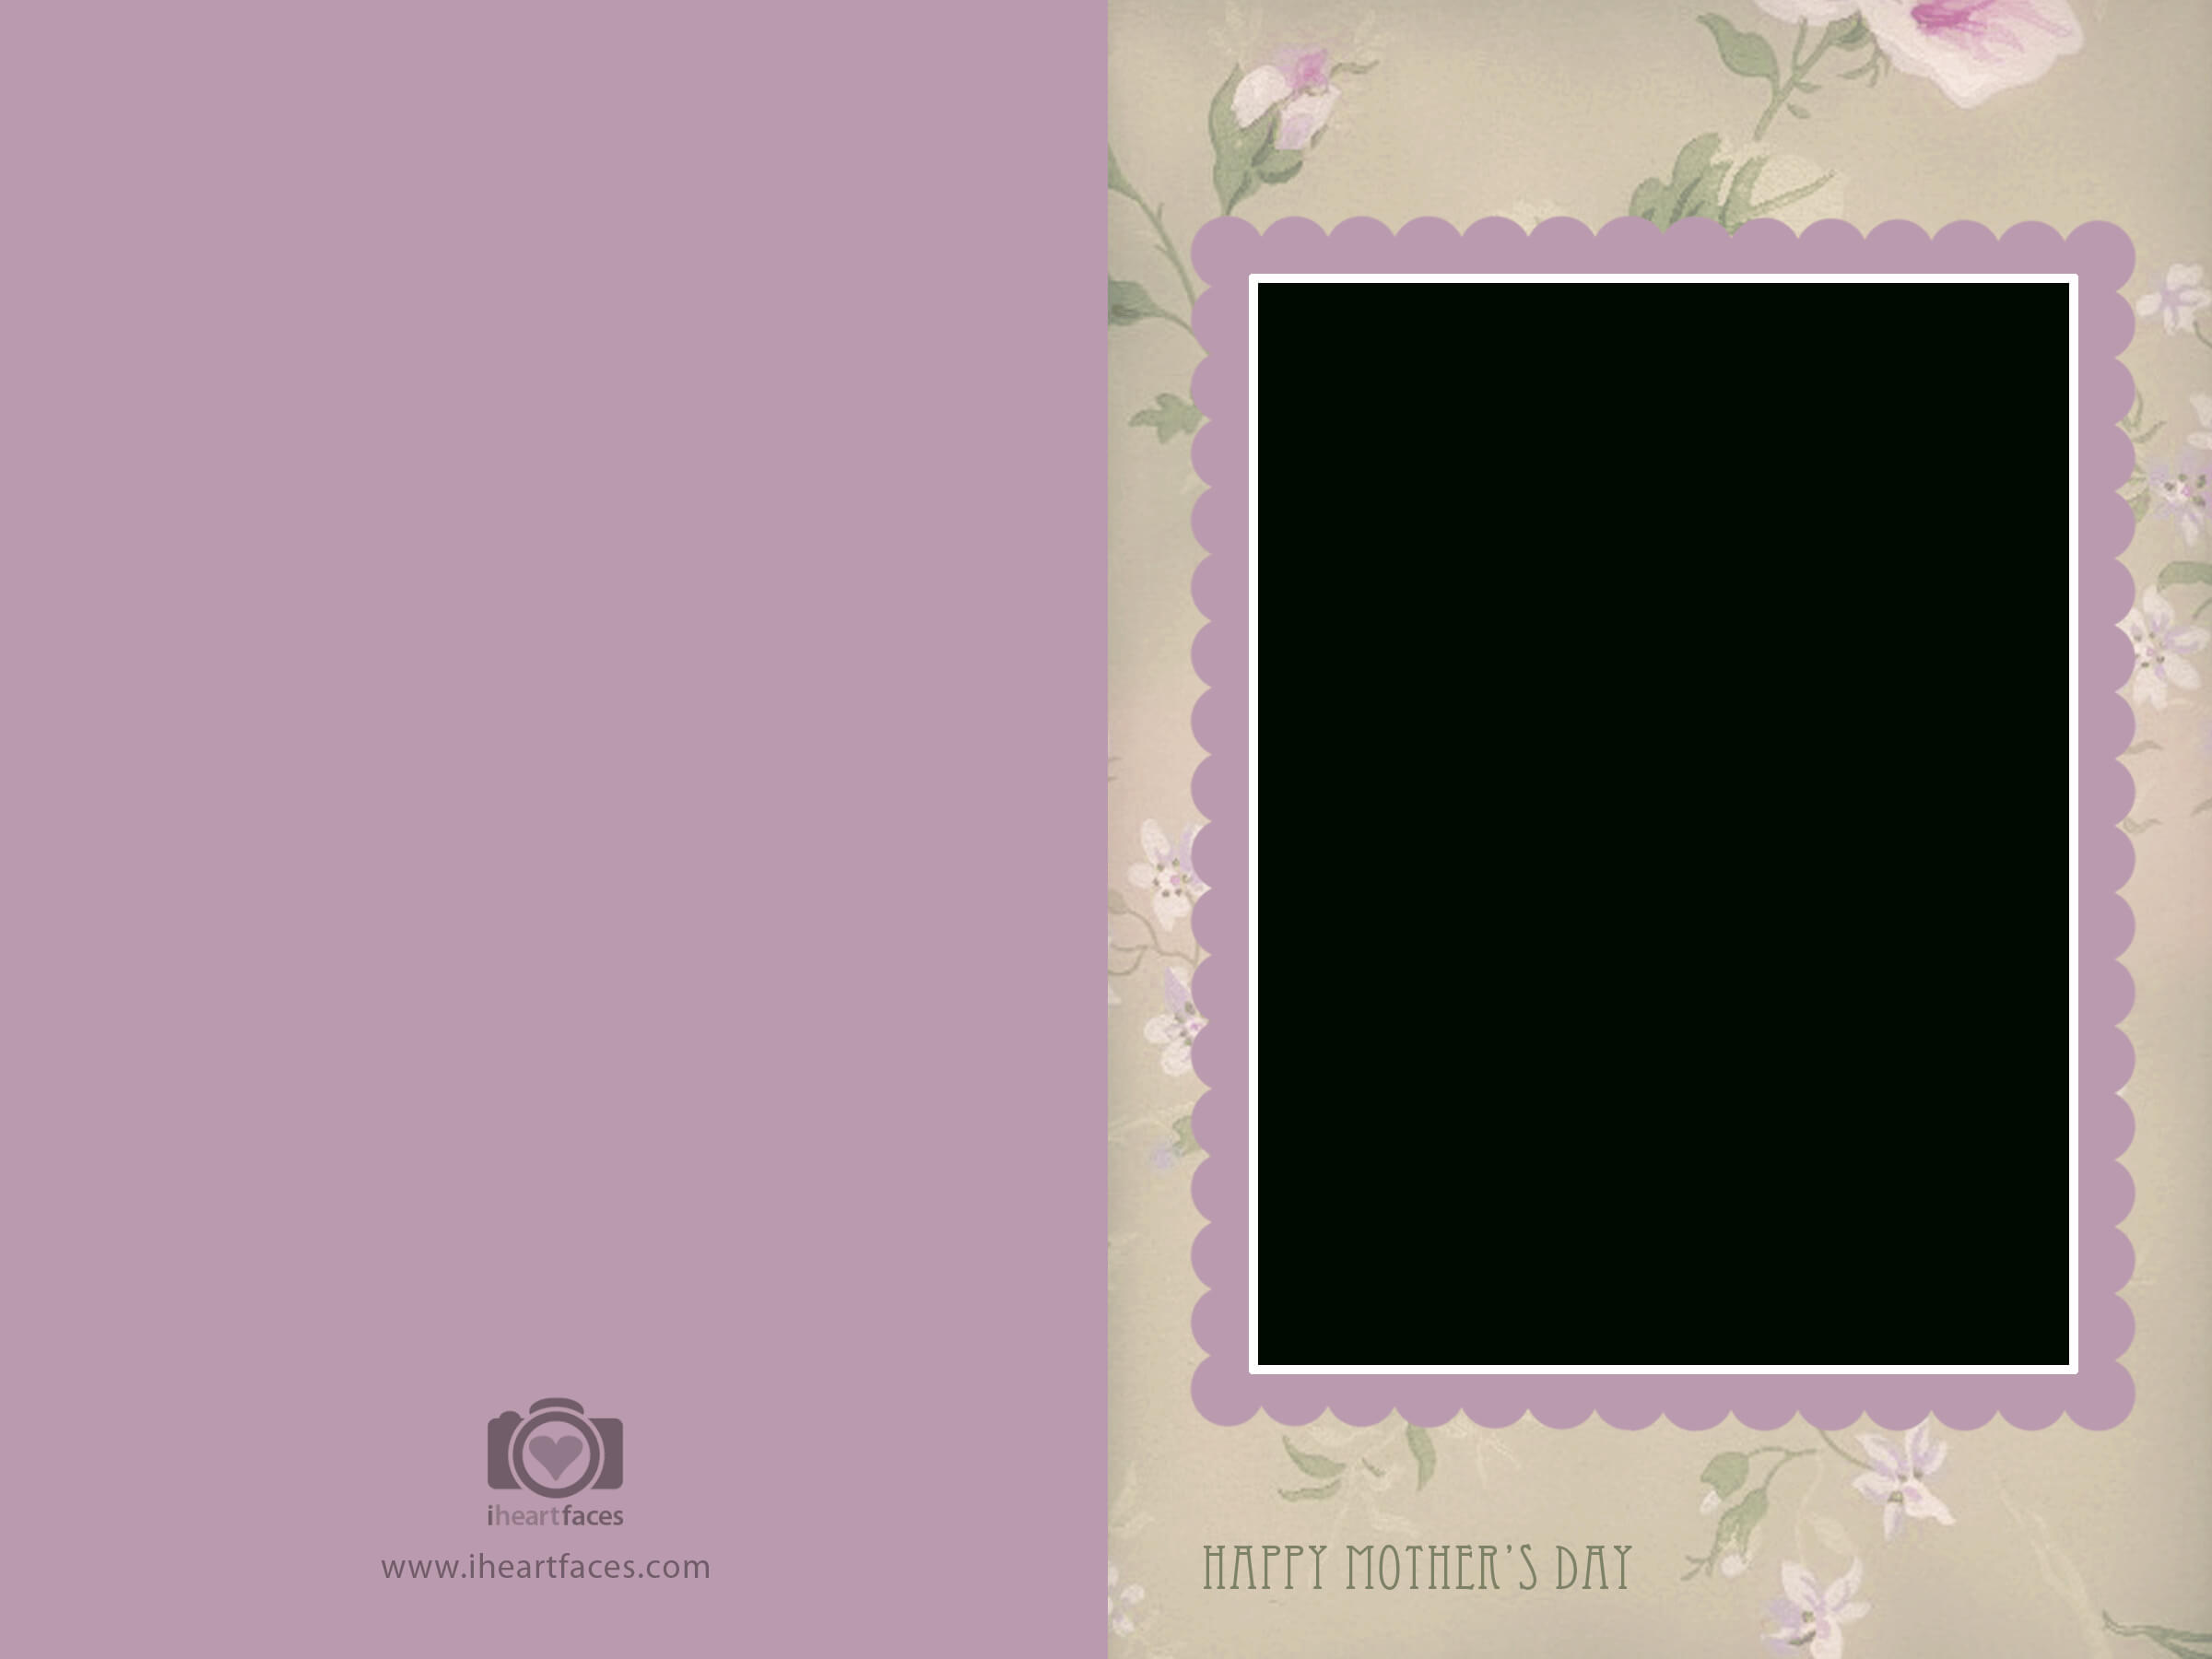 005 Blank Greeting Card Template Photoshop Ideas Intended For Free Printable Blank Greeting Card Templates